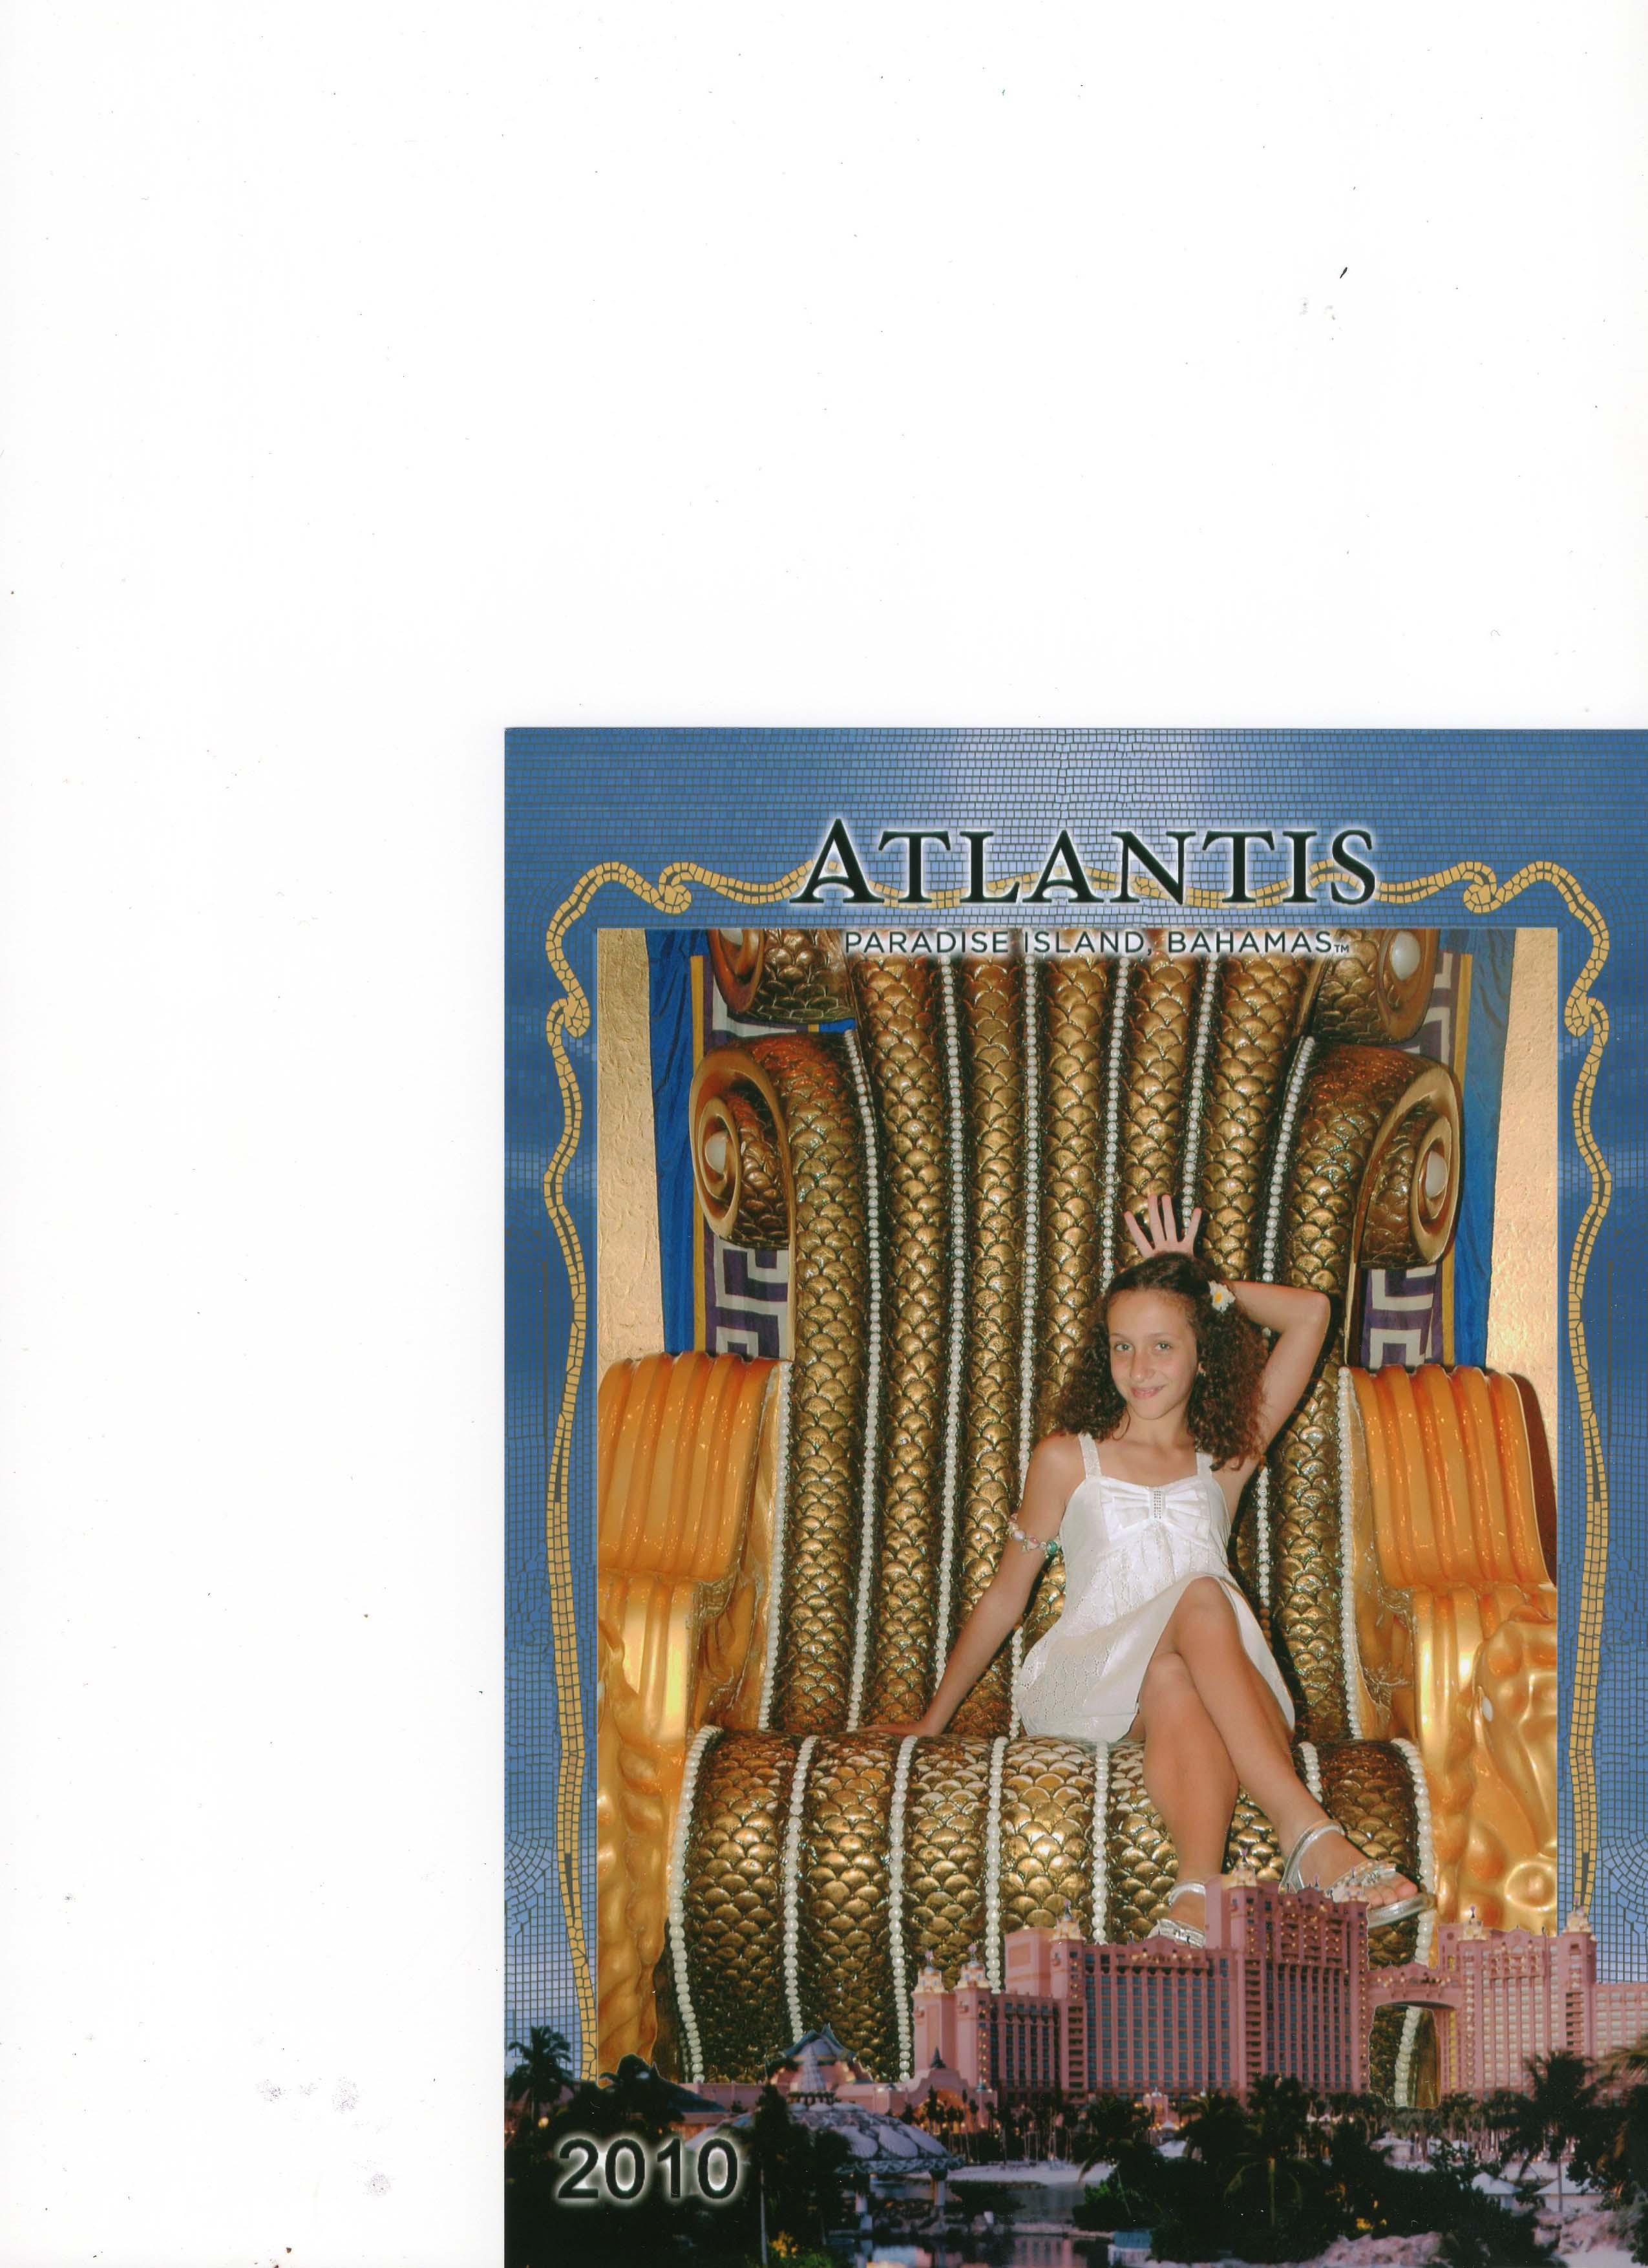 Throne Hotel Atlantis Paradise Island Bahamas